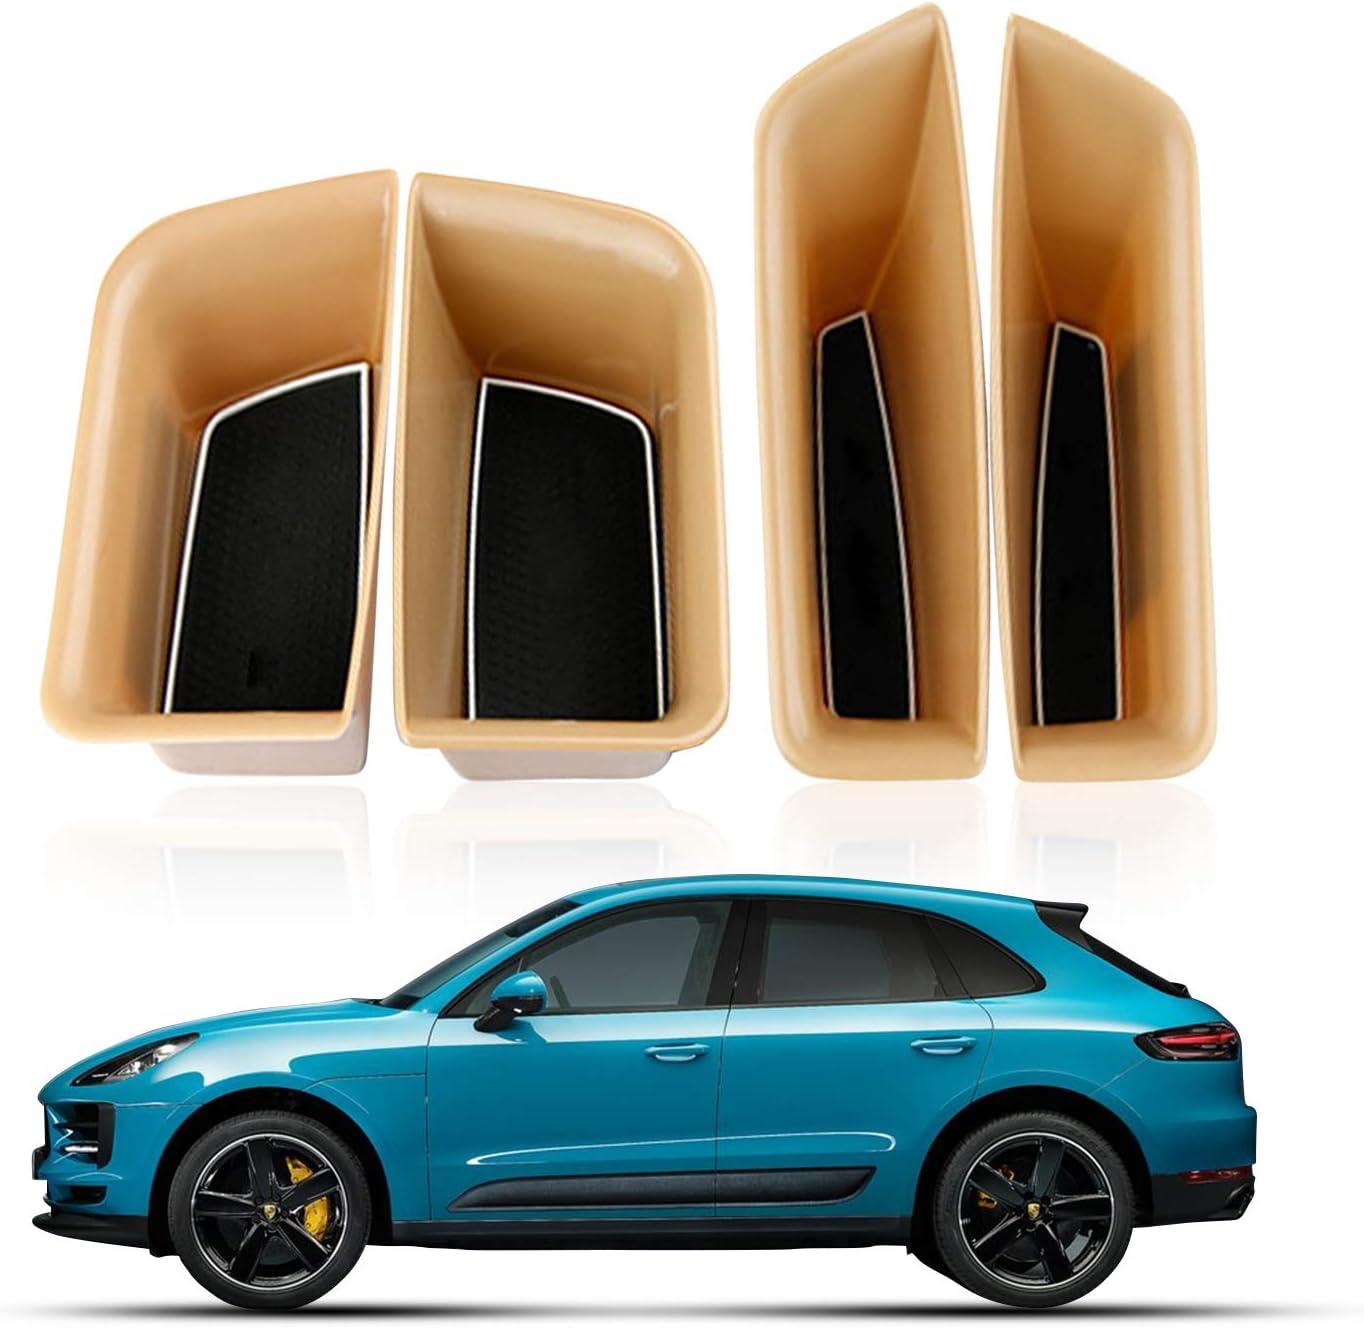 4PCS YEE PIN 4-Door Black Organizer Tray Car Door Side Handle Pocket Storage Box Passenger Storage Tray Organizer Grab Handle Box Accessory for 2015-2020 Porsche Macan